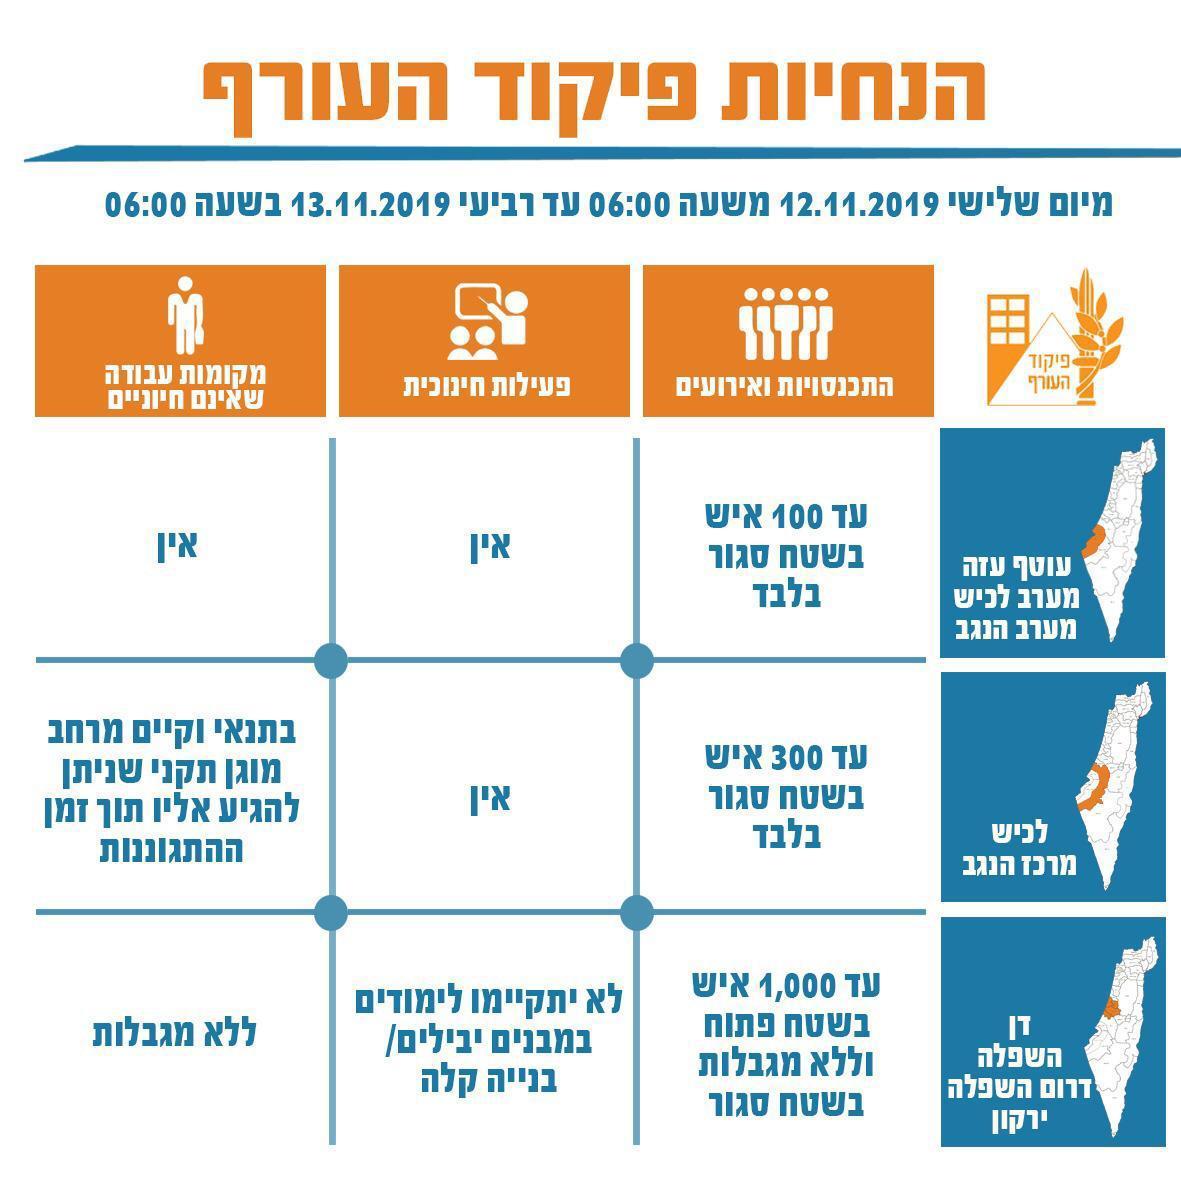 Photo of עיריית רמת גן הכריזה כי בשל המצב לא יתקיימו היום לימודים בכל מוסדות החינוך. כל המקלטים הציבוריים נפתחו בעיר